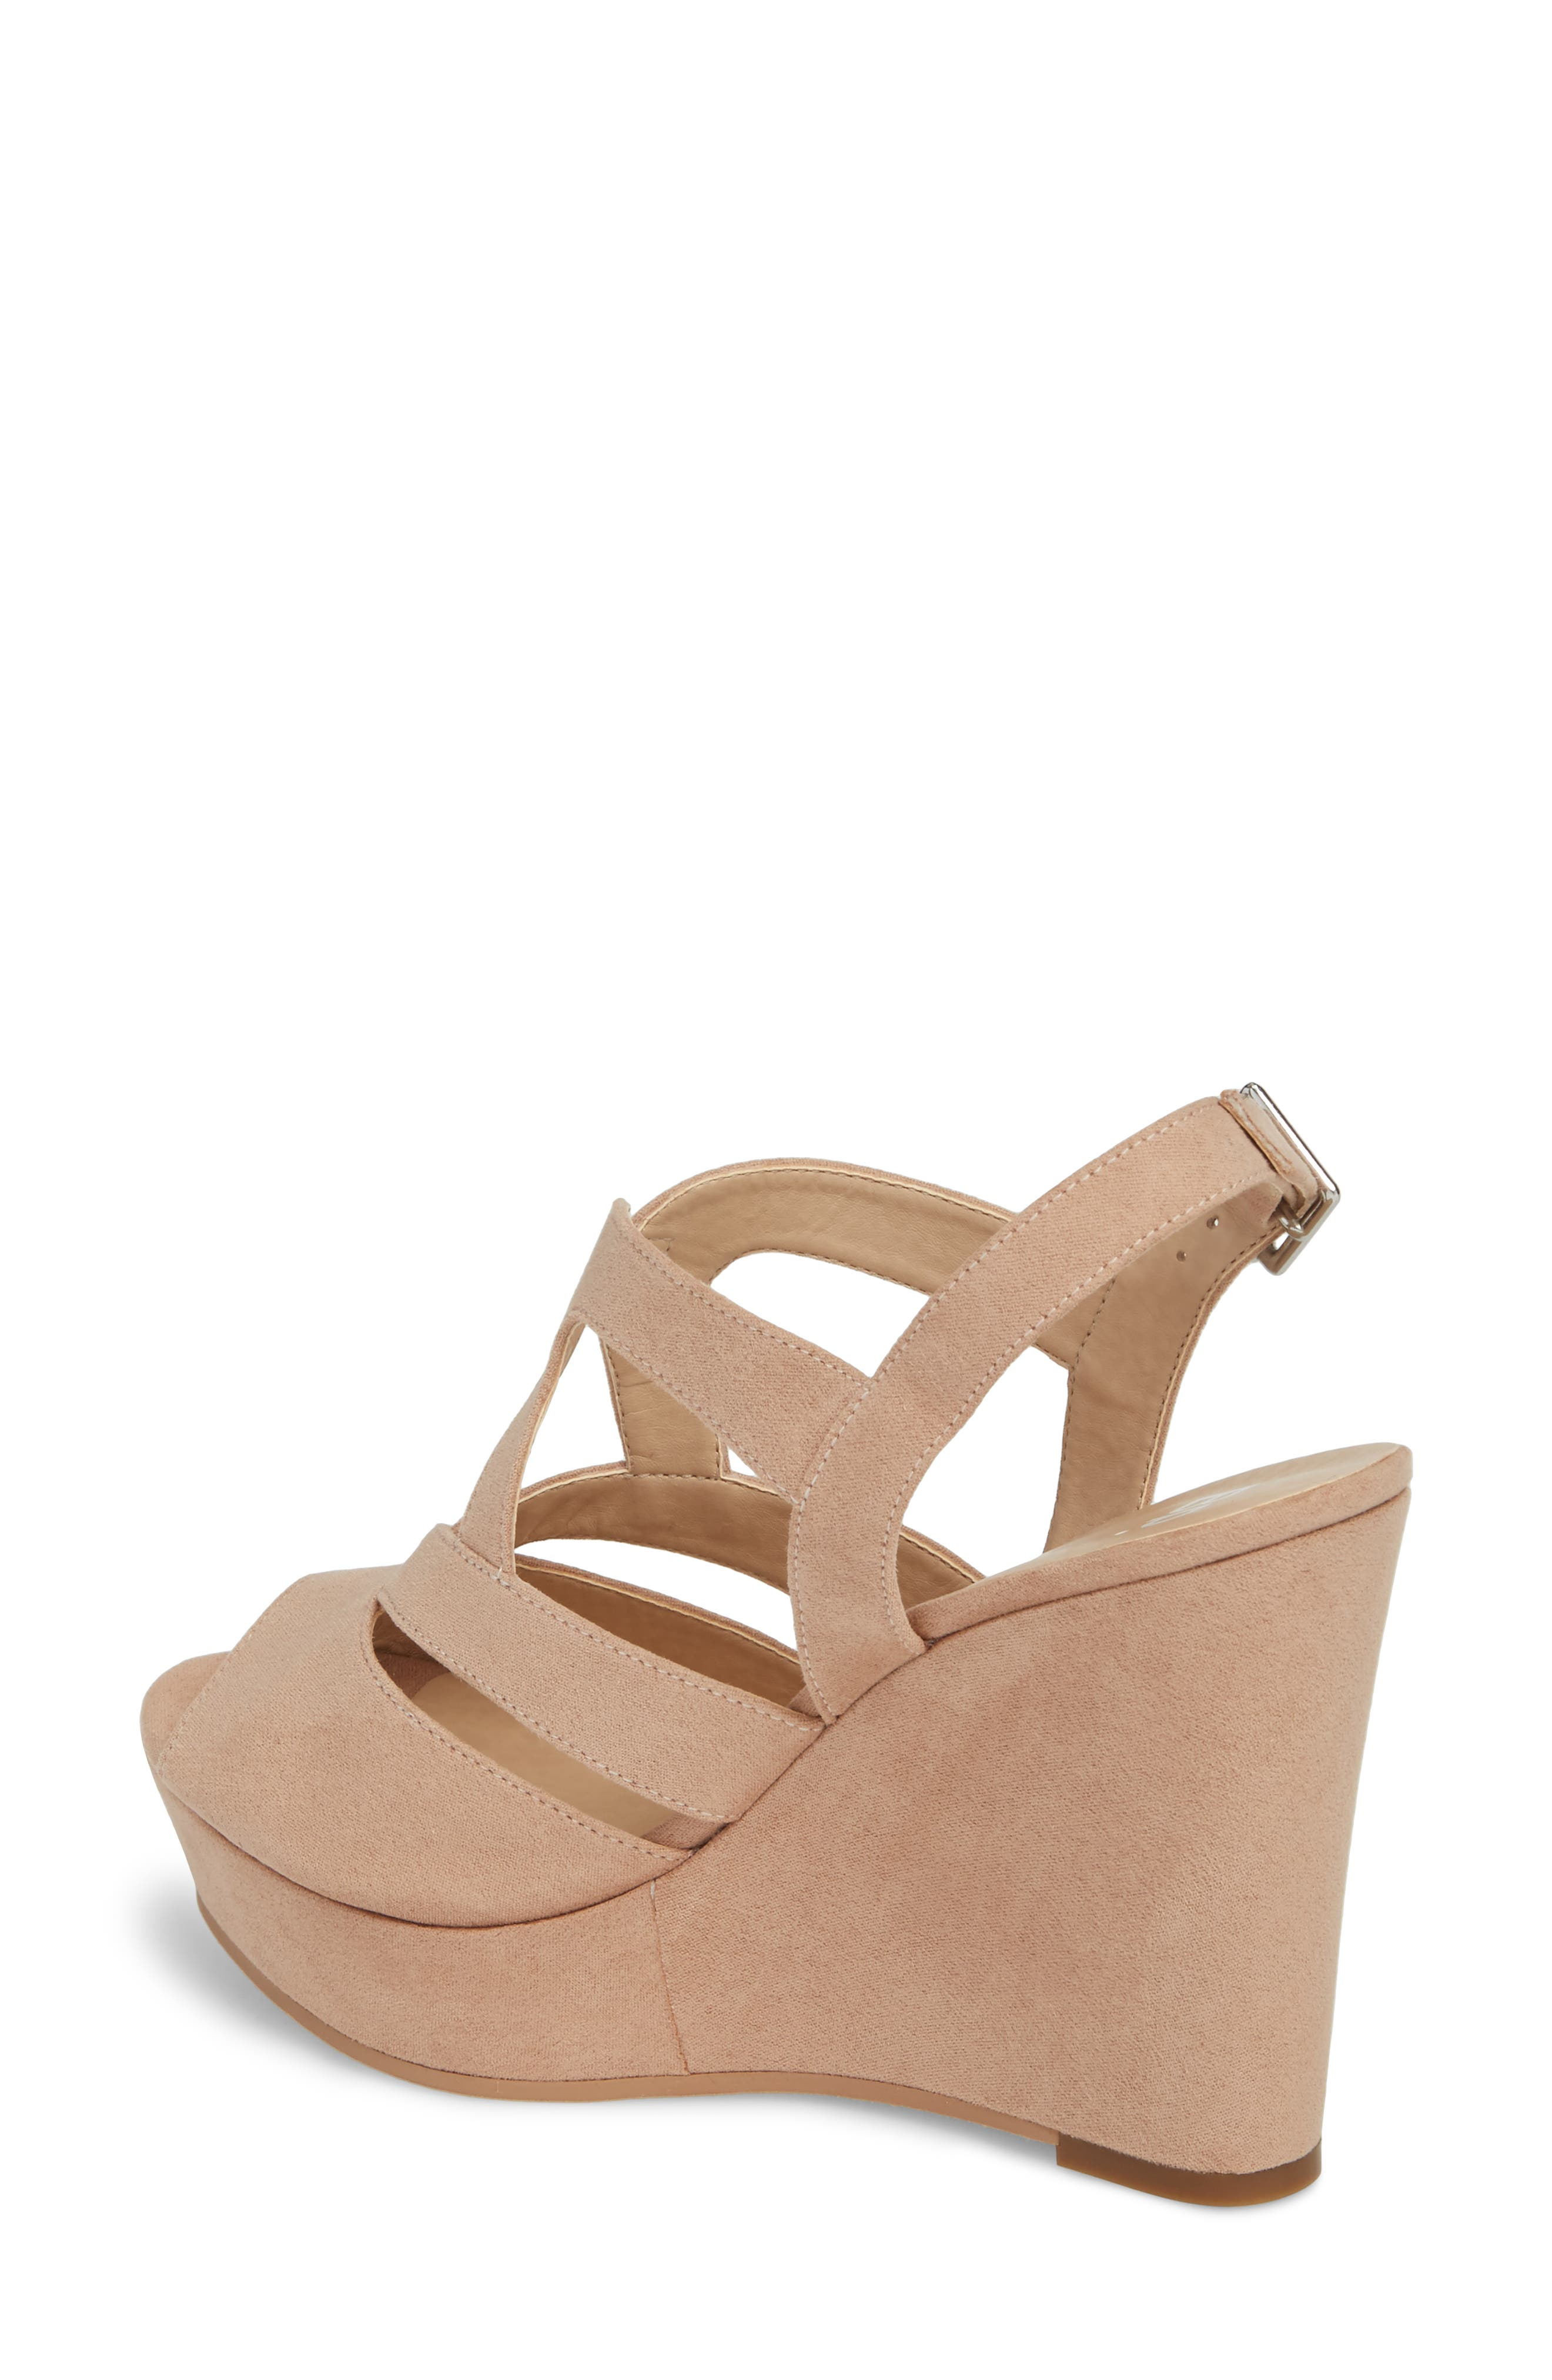 Sunny Platform Wedge Sandal,                             Alternate thumbnail 2, color,                             Nude Faux Suede